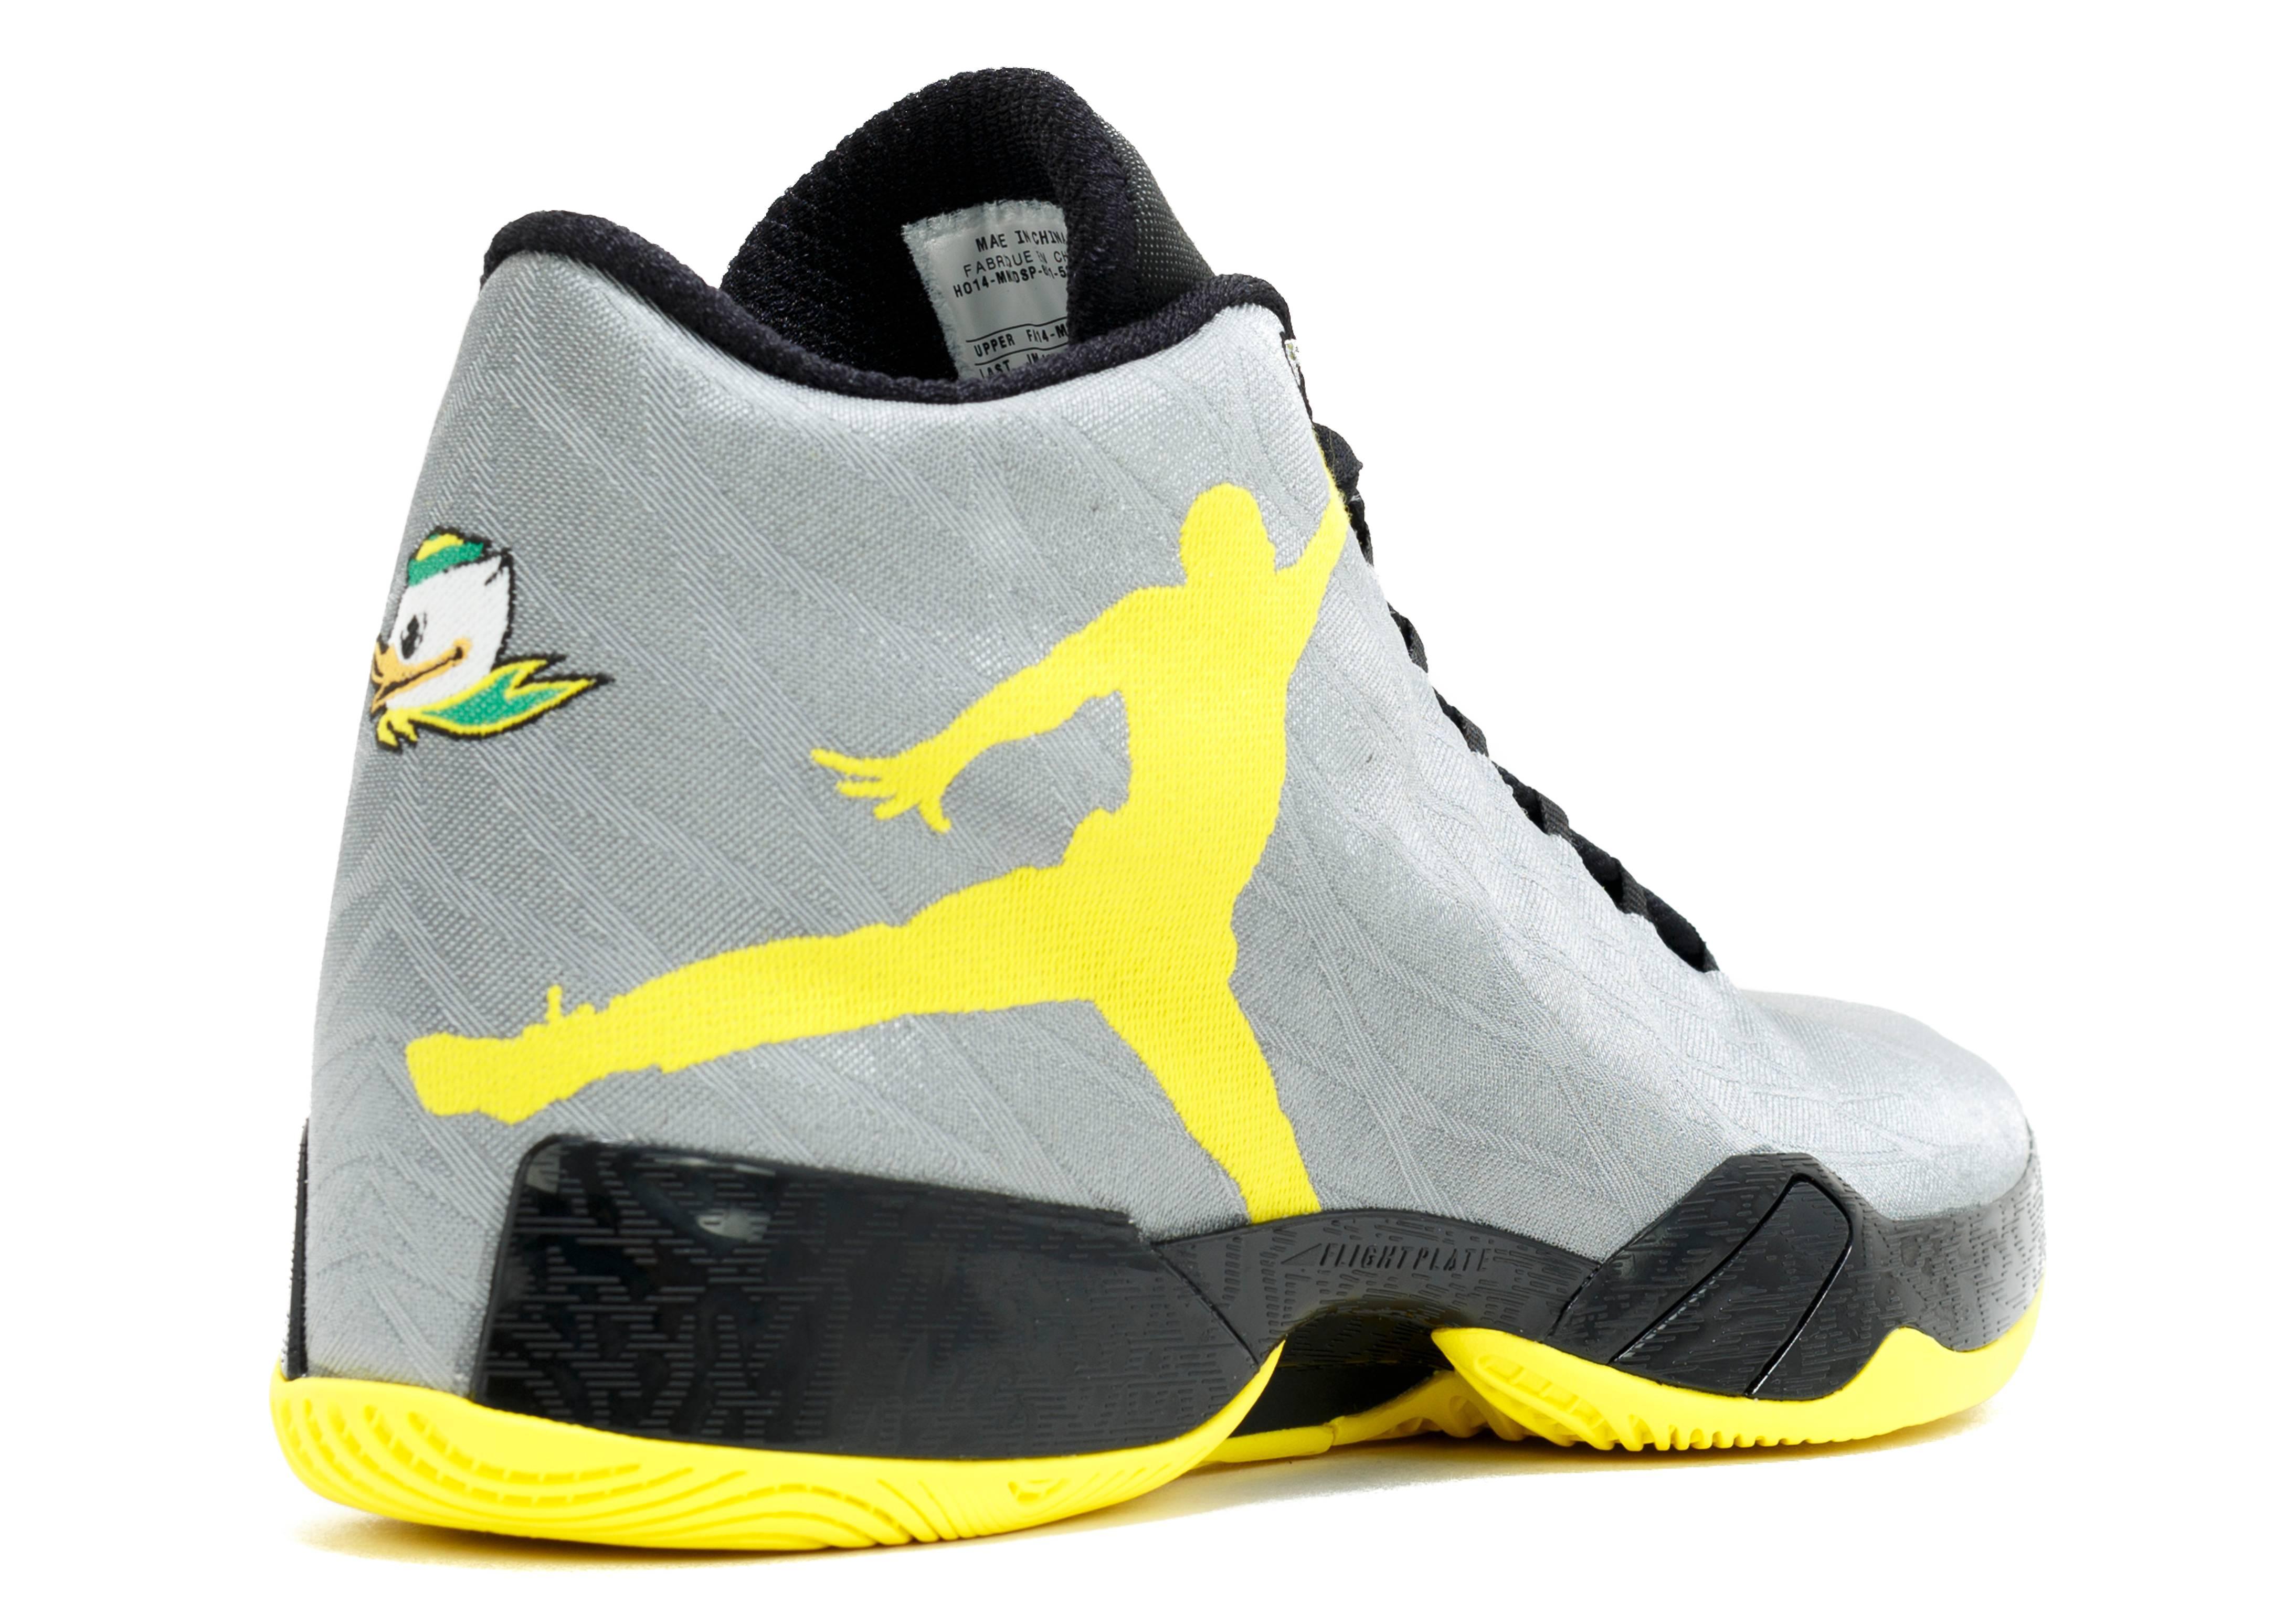 finest selection 8140c 26885 Air Jordan 29 Pe